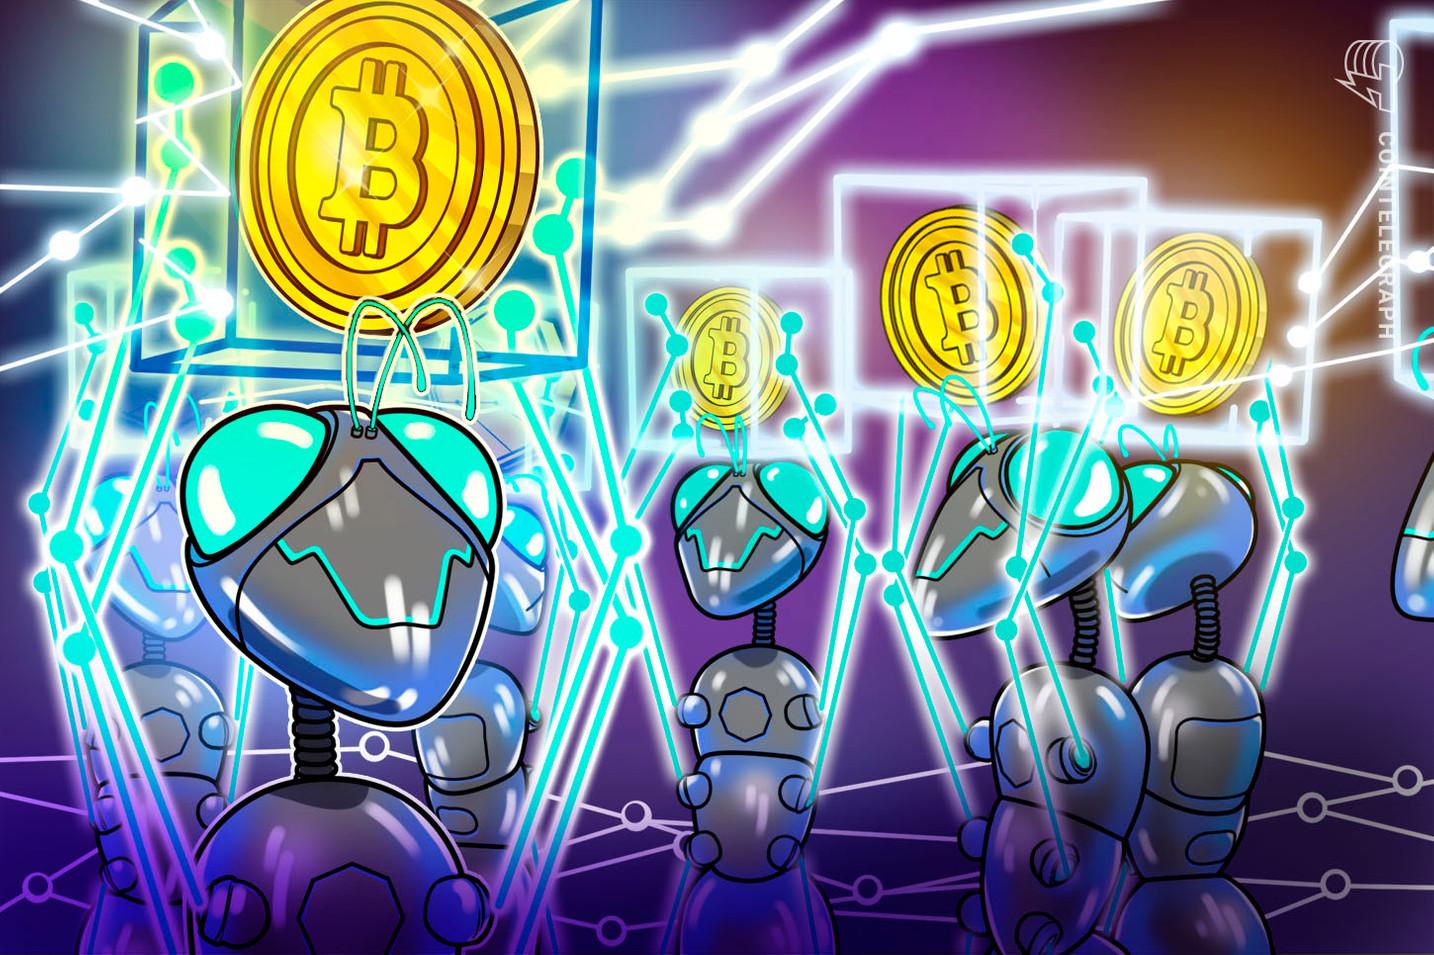 Bitcoin miner Poolin immortalizes El Salvador's BTC adoption on the blockchain